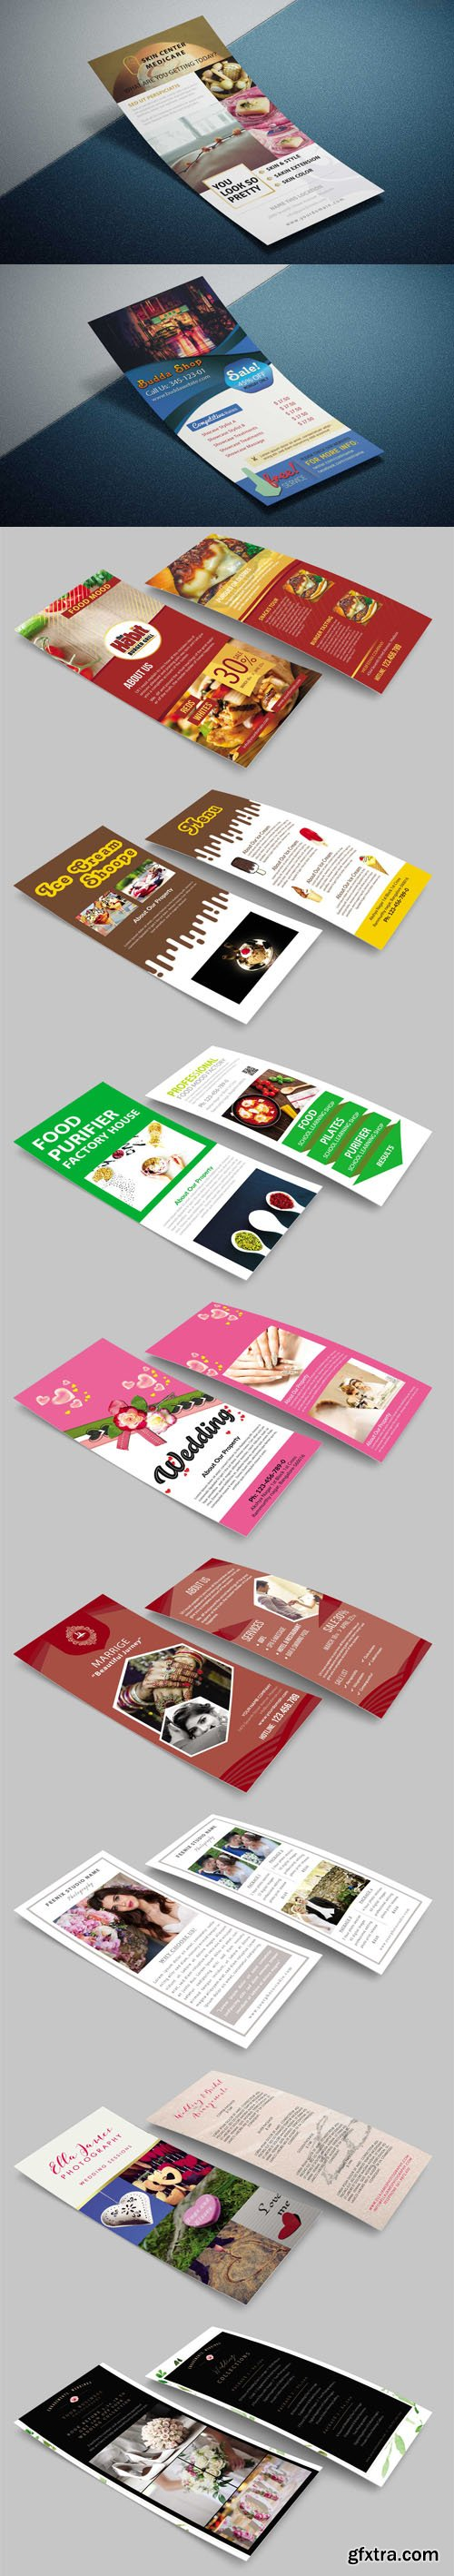 10+ Premium Rack Cards PSD Templates Collection